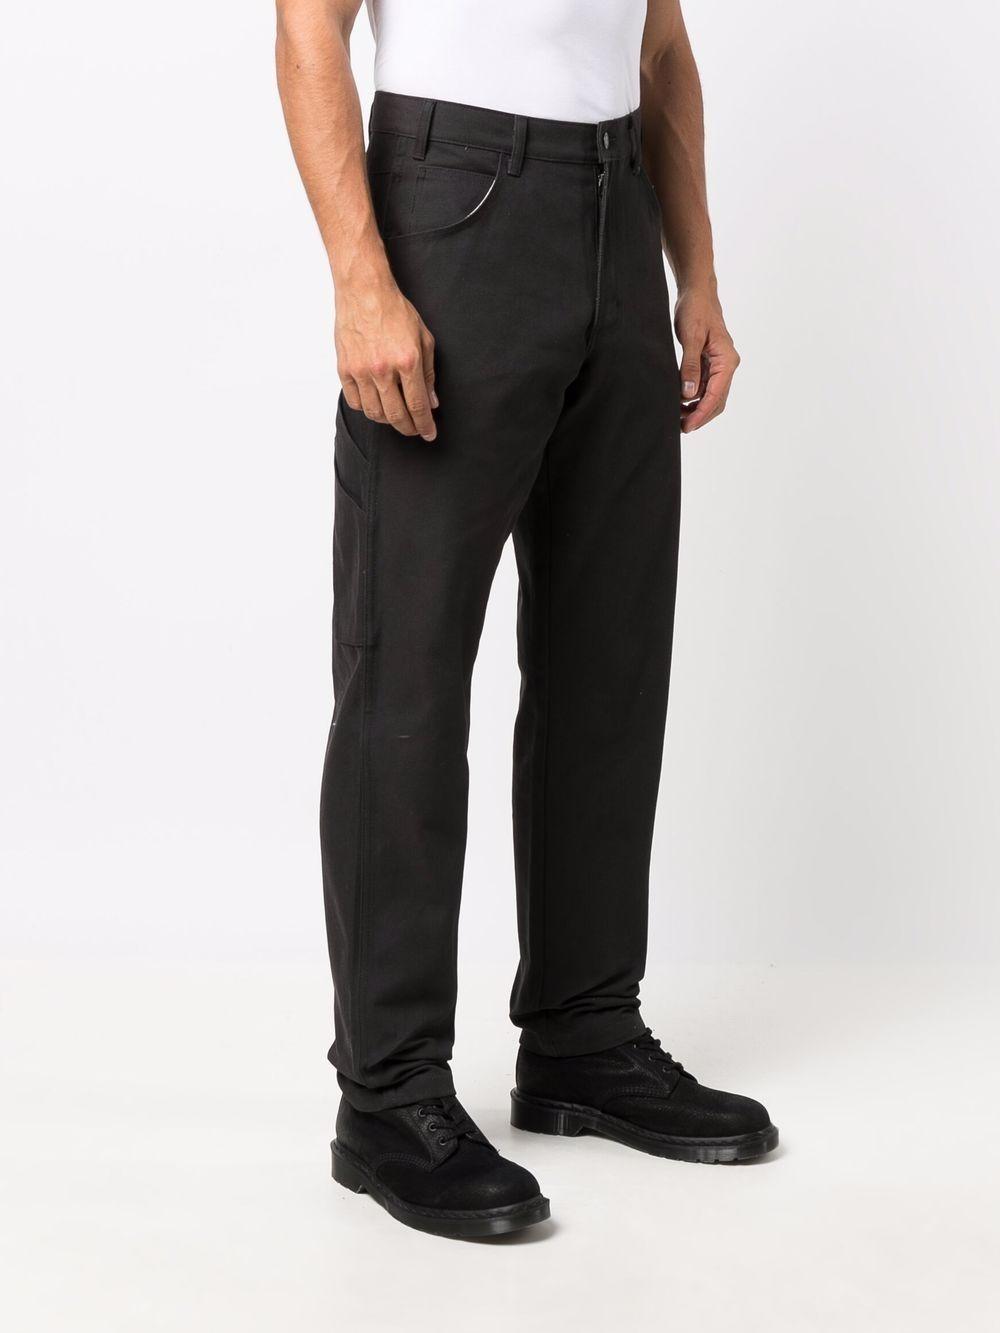 pantaloni con tasche uomo neri in cotone DICKIES | Pantaloni | DK0A4XIFBLK1